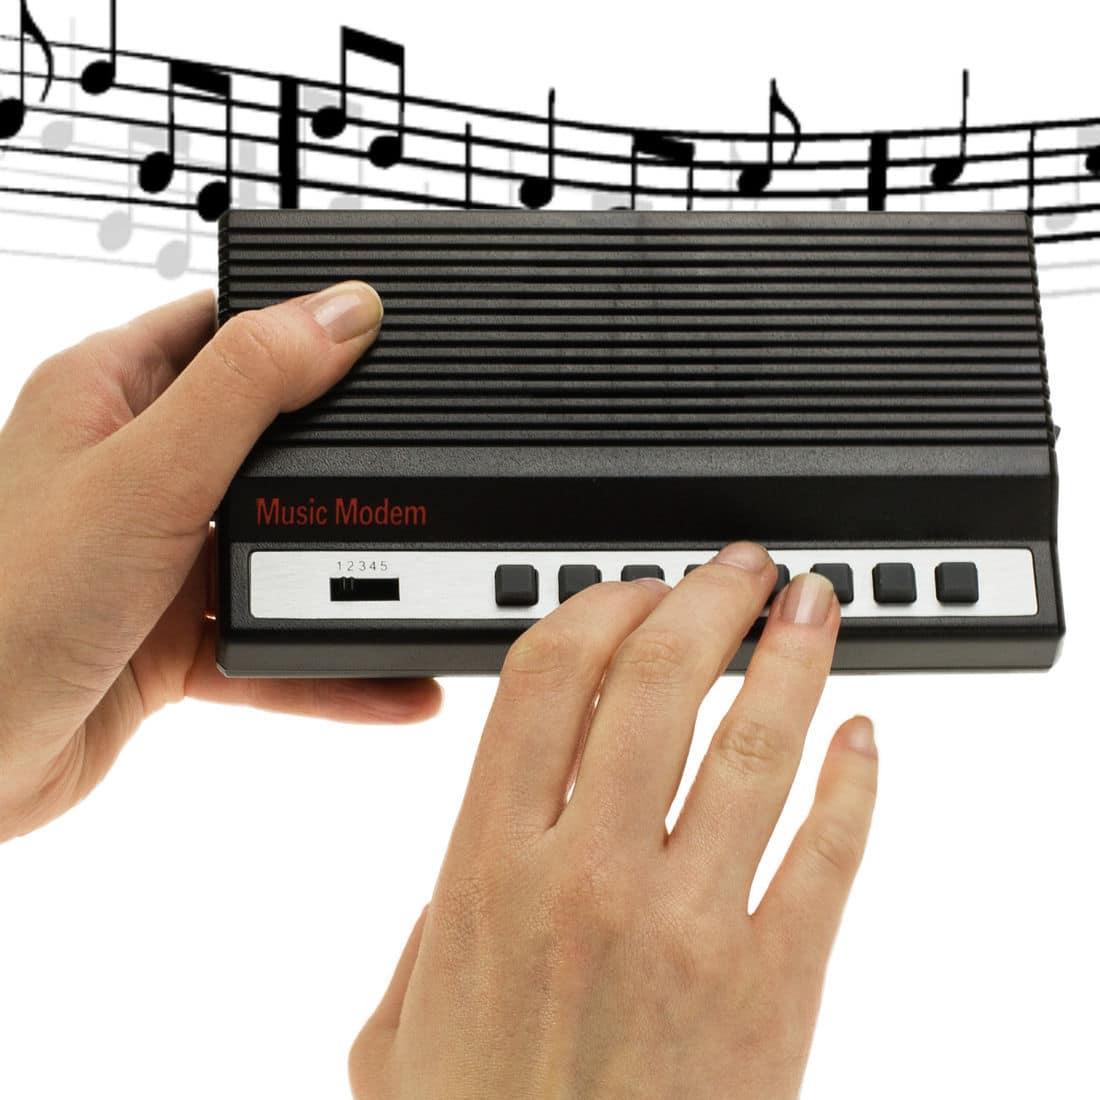 Music_Modem_10